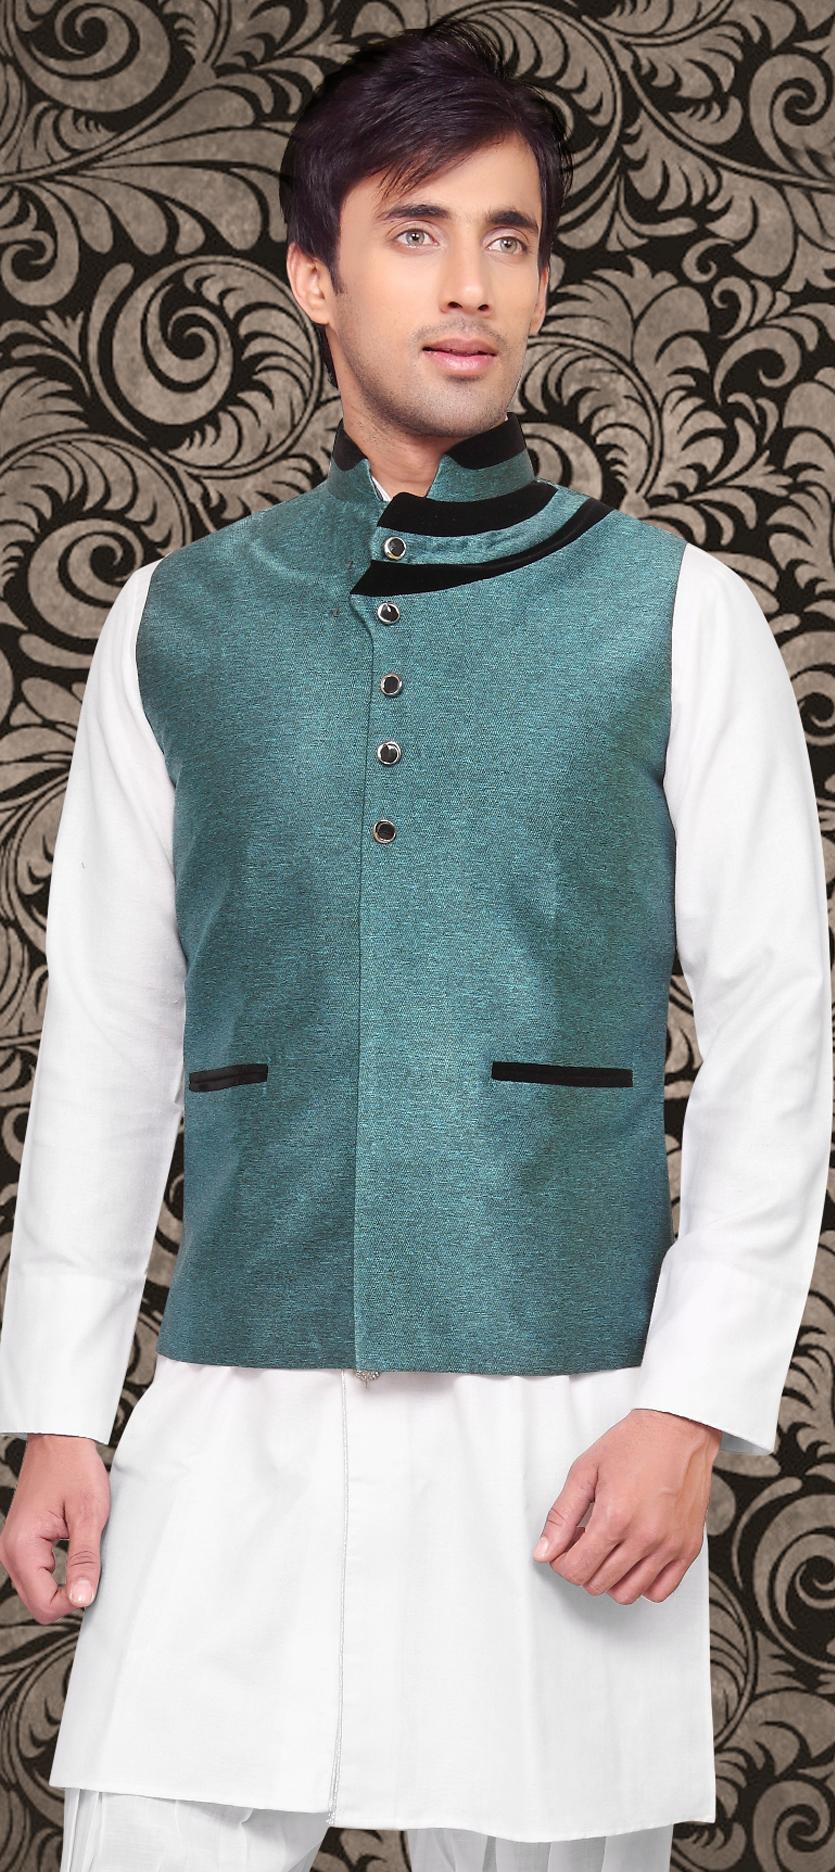 502972: Blue color family stitched Nehru jacket .